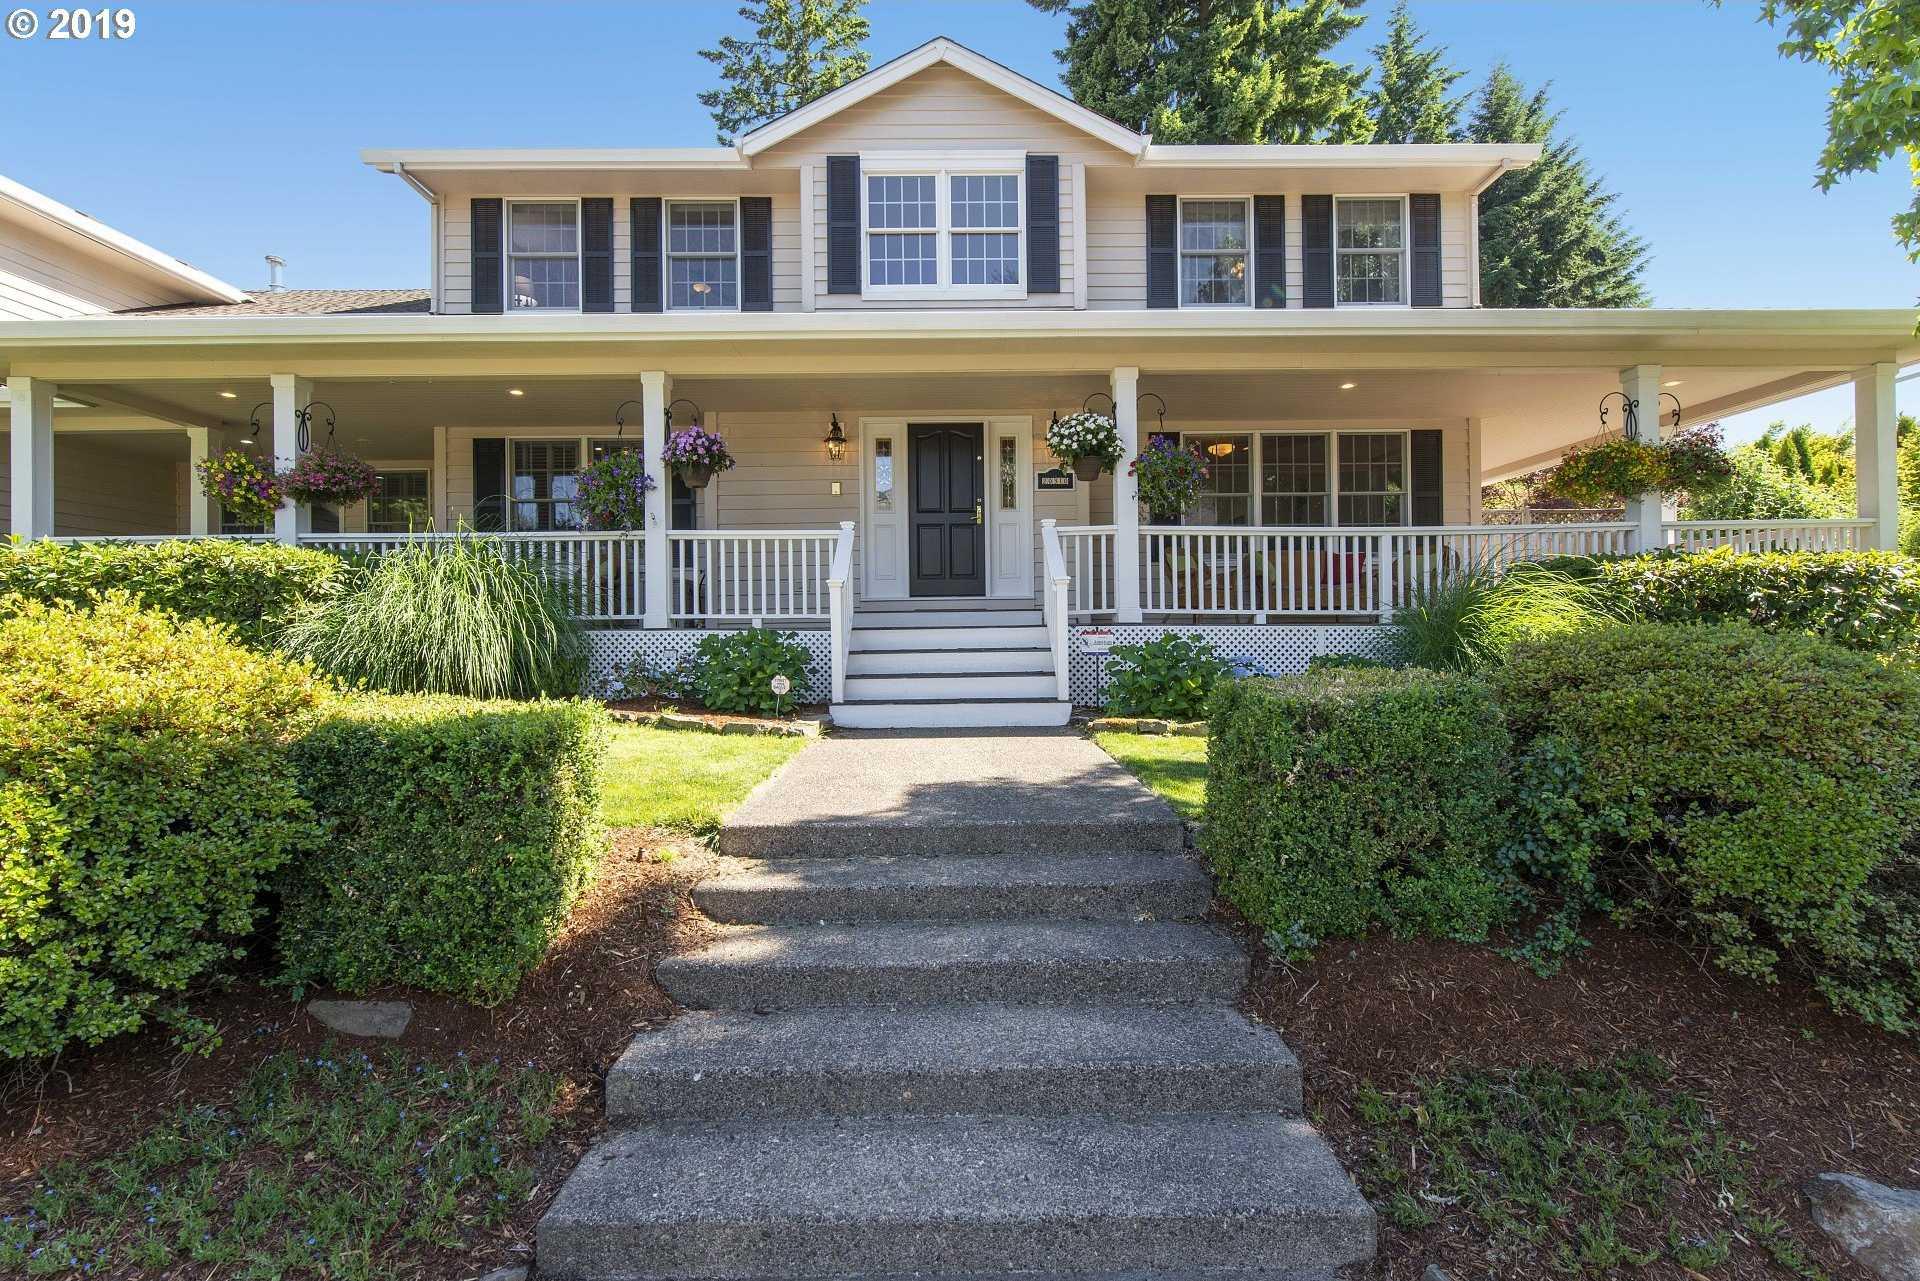 $974,900 - 4Br/5Ba -  for Sale in Conifer Ridge, Beaverton